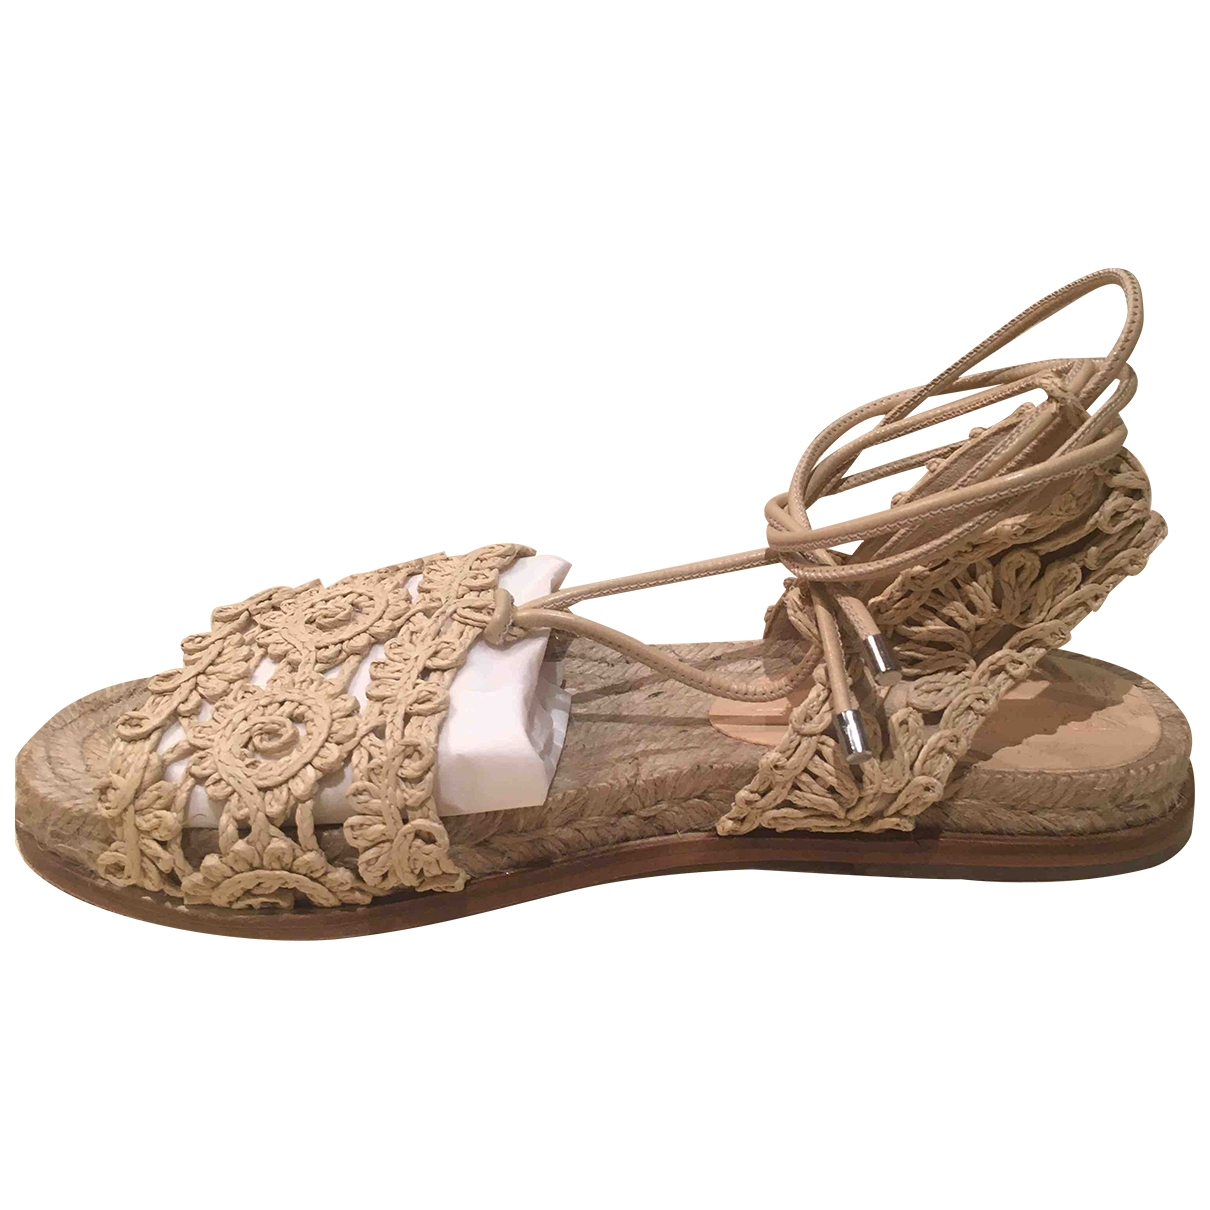 Sandalias de Lona Max Mara Weekend